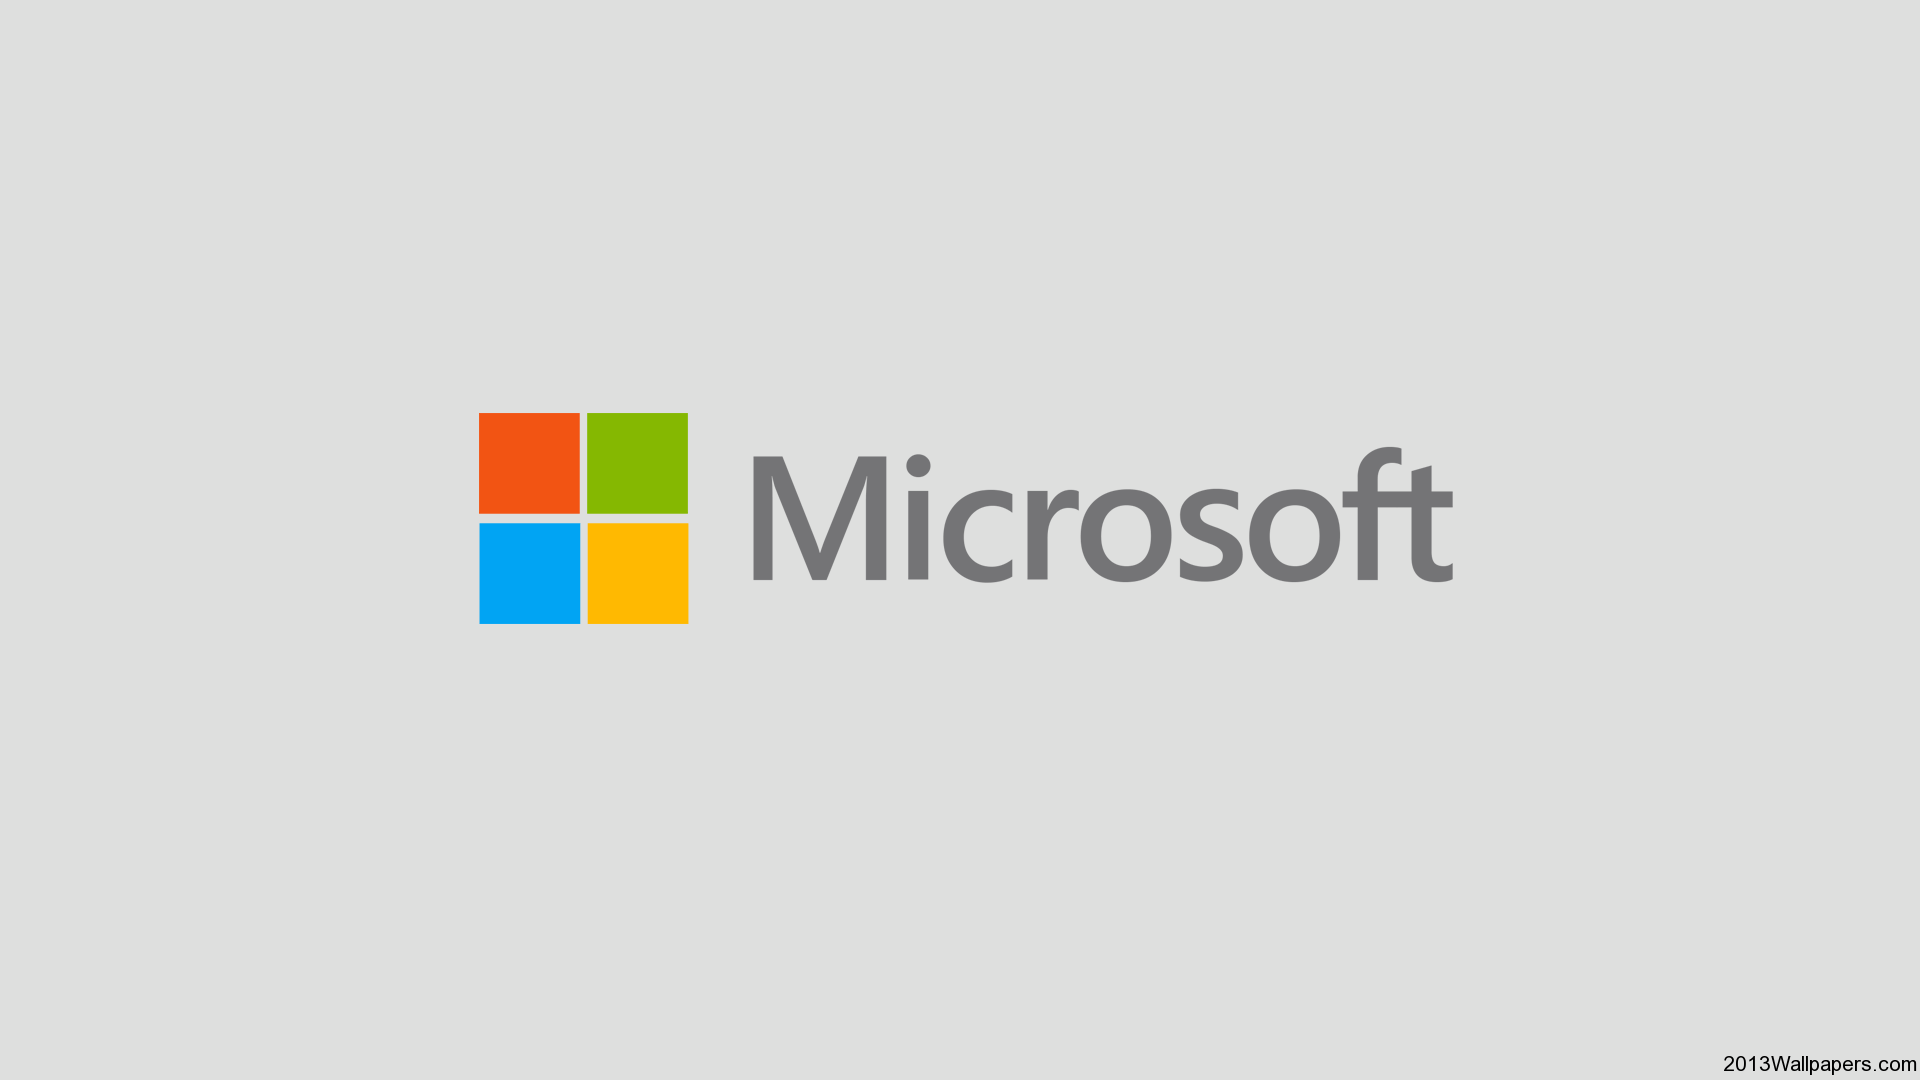 Microsoft Logo Wallpapers - Top Free Microsoft Logo Backgrounds